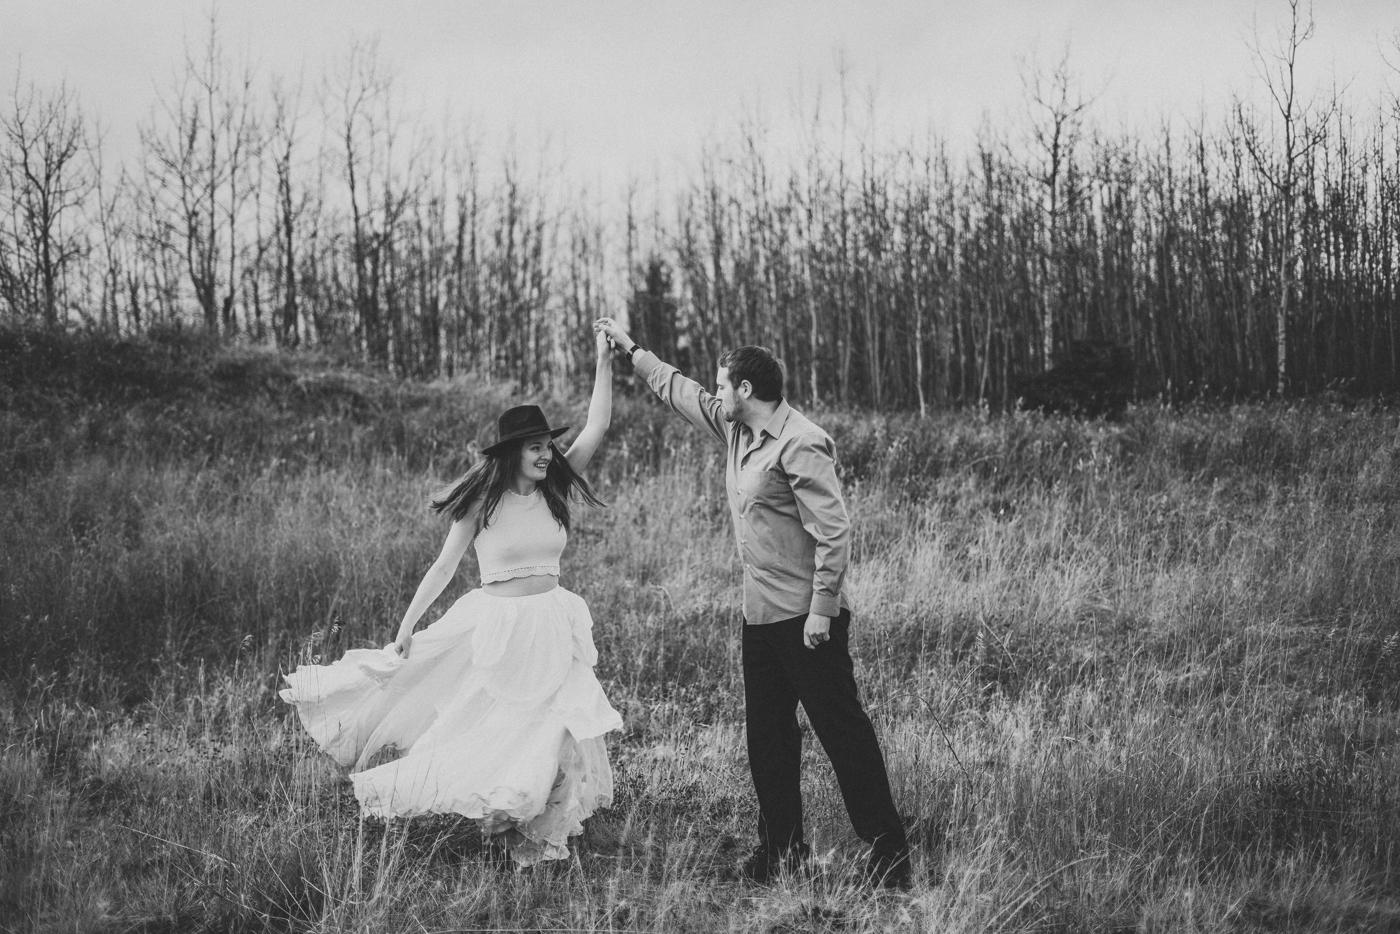 FortSt.John_photographer_TyraEPhotography_Wedding_Couple_Family_Photograhy_DawsonCreek_Elopement_Bride_Boduoir_Portraits-51.jpg